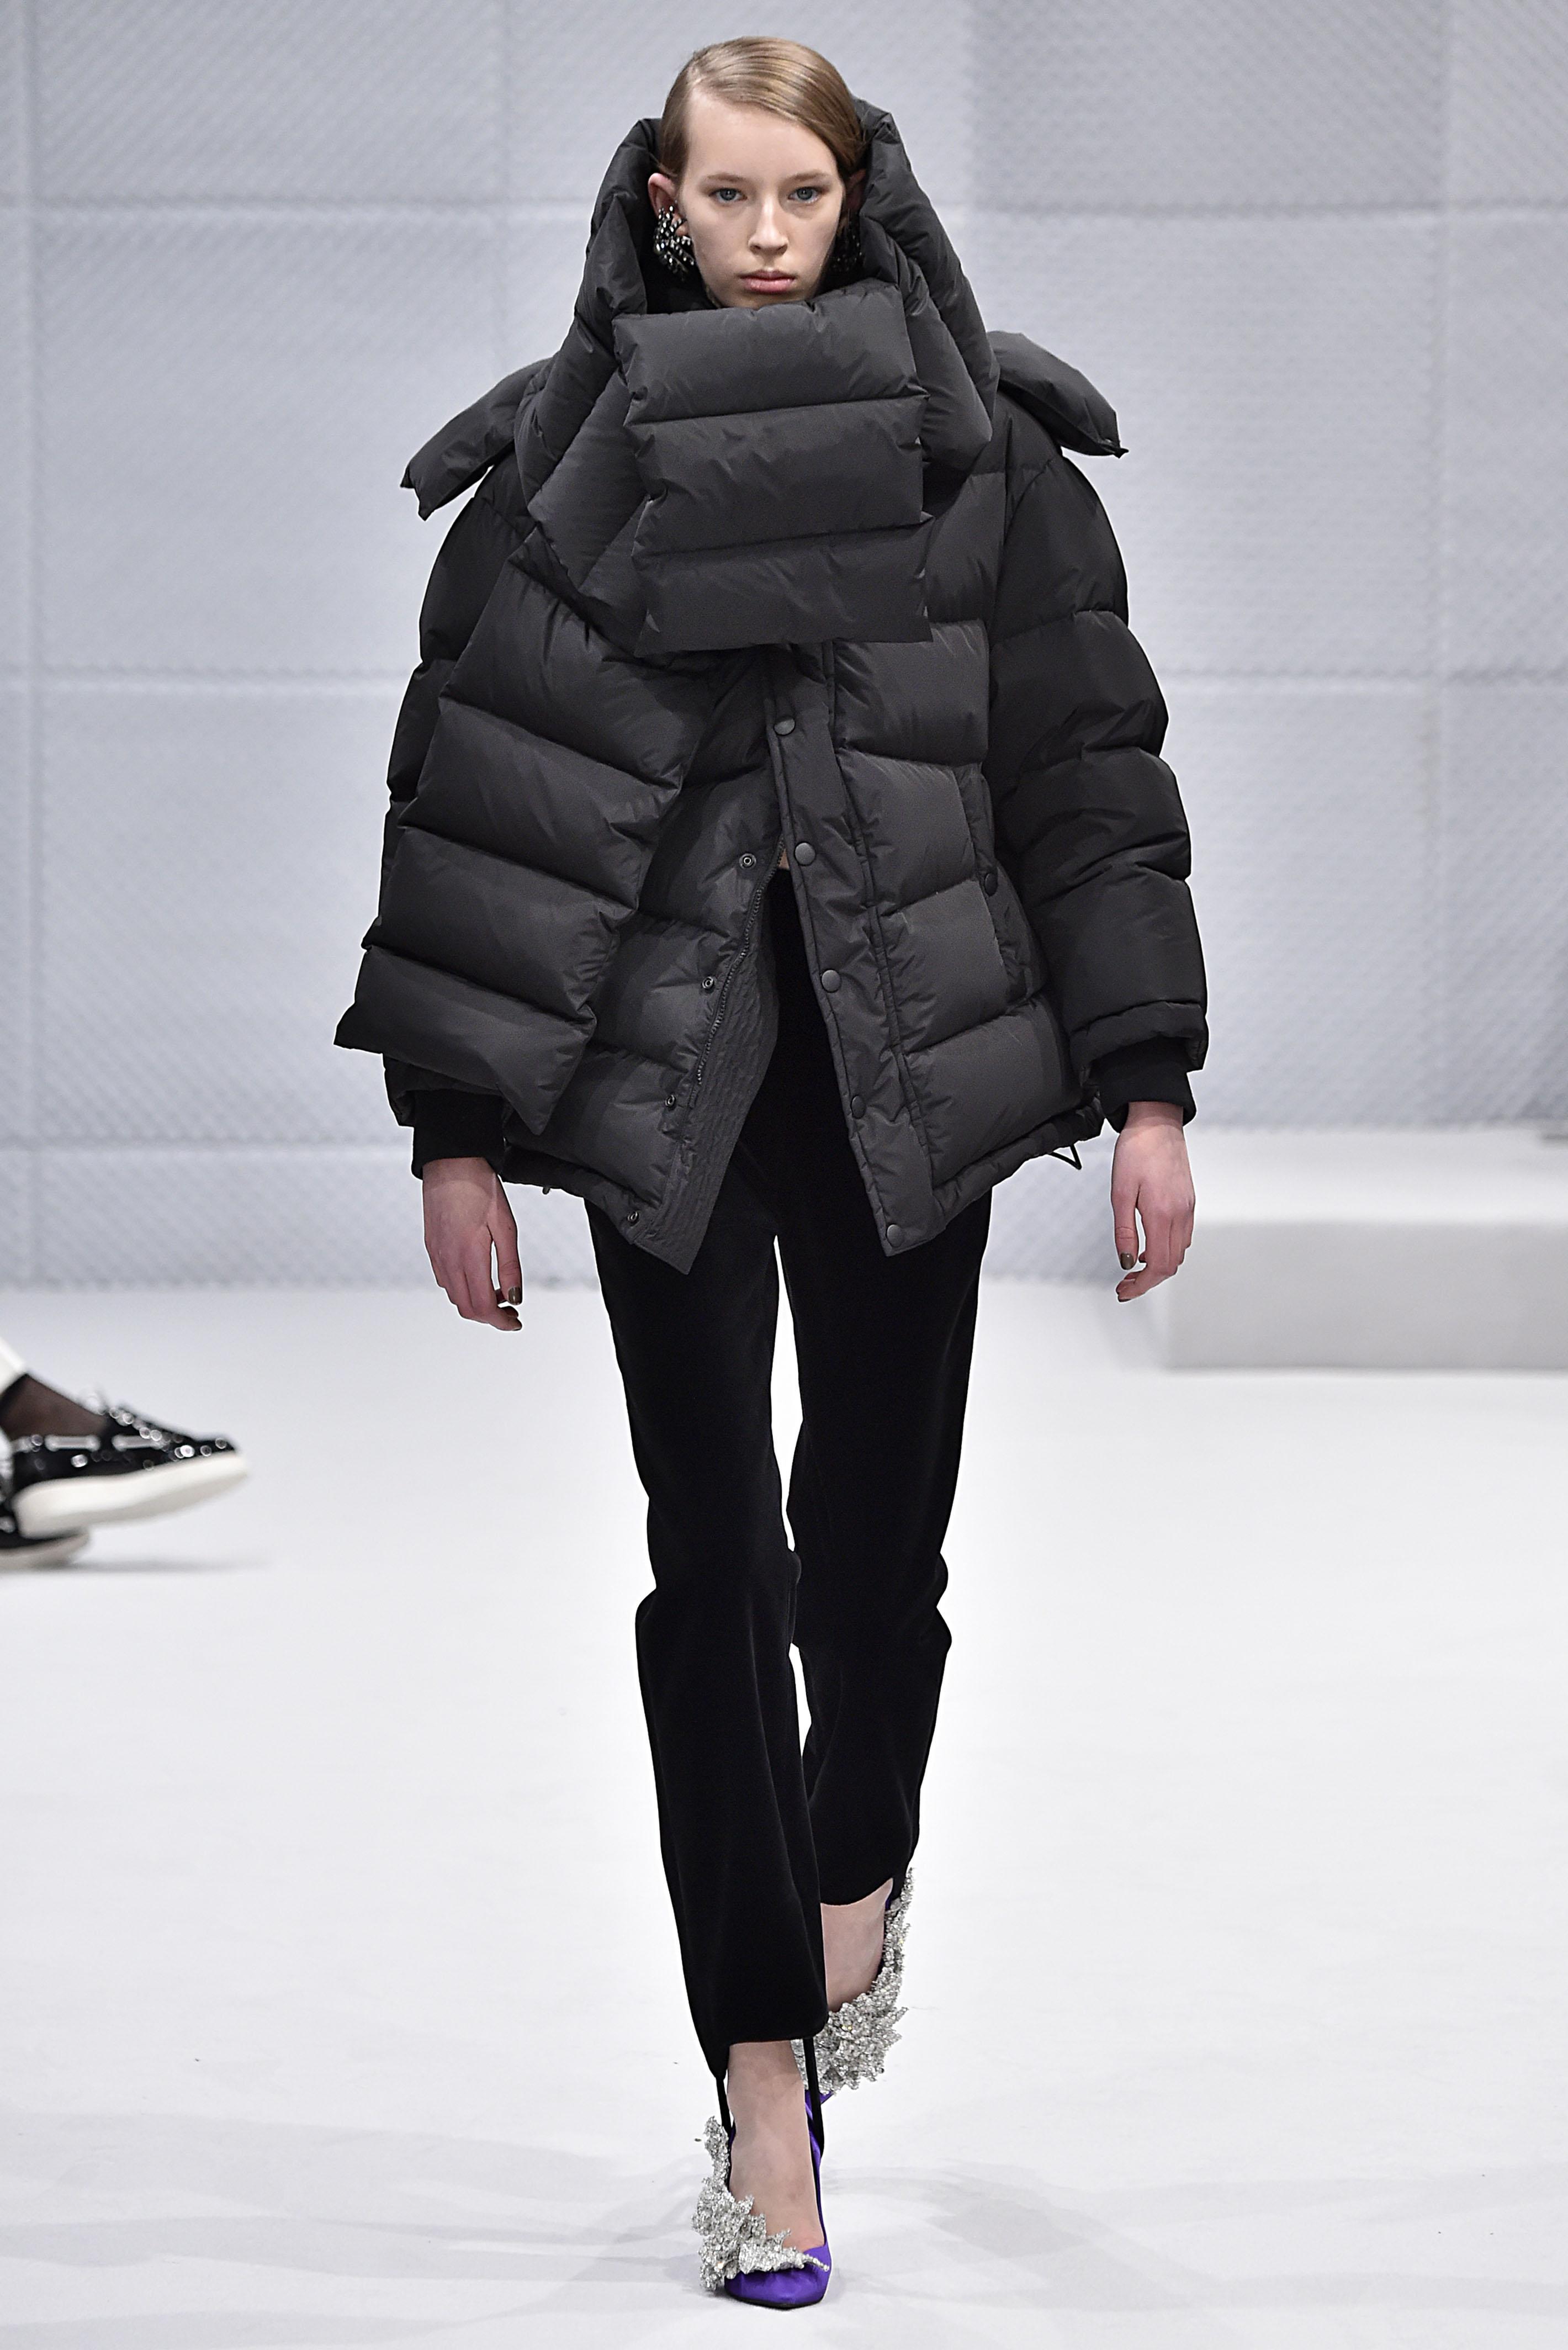 Chic Puffer Jackets For Winter Coolest Winter Puffer Coats